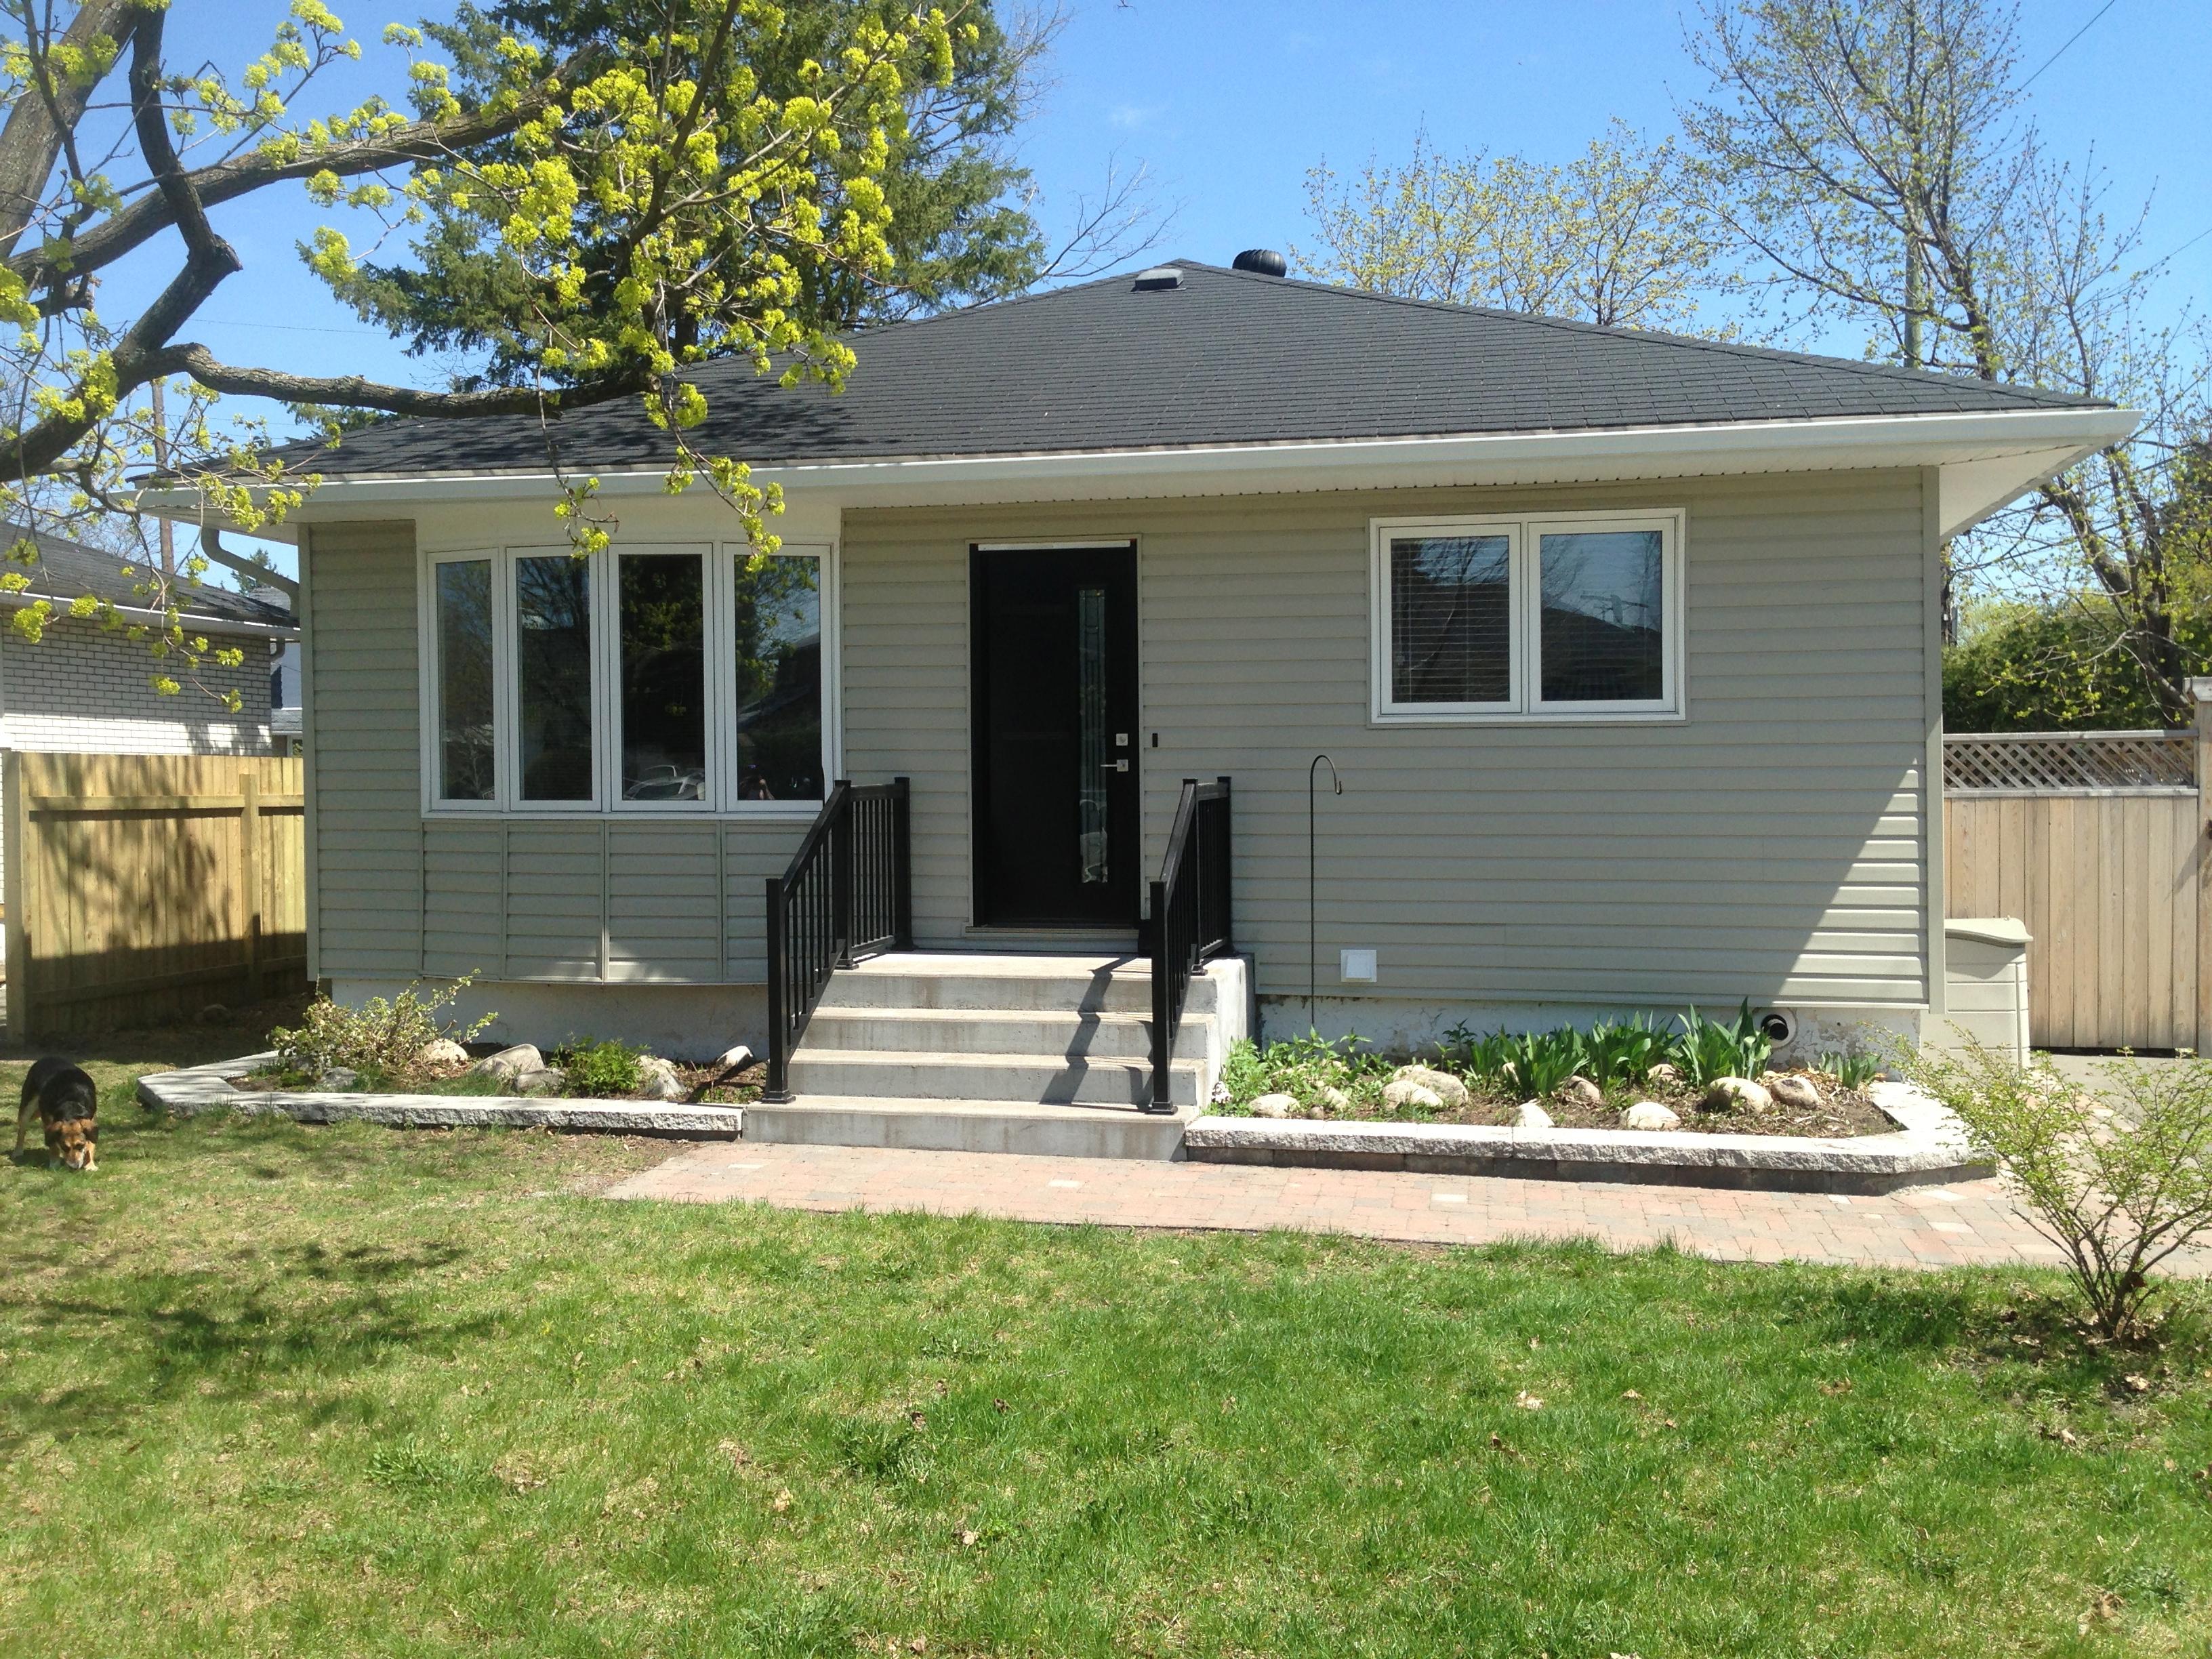 NL Renovations   general contracting & Home Renovations   home, kitchen, bathroom, windows, doors, siding, fences, decks, basement, laundry room, new builds